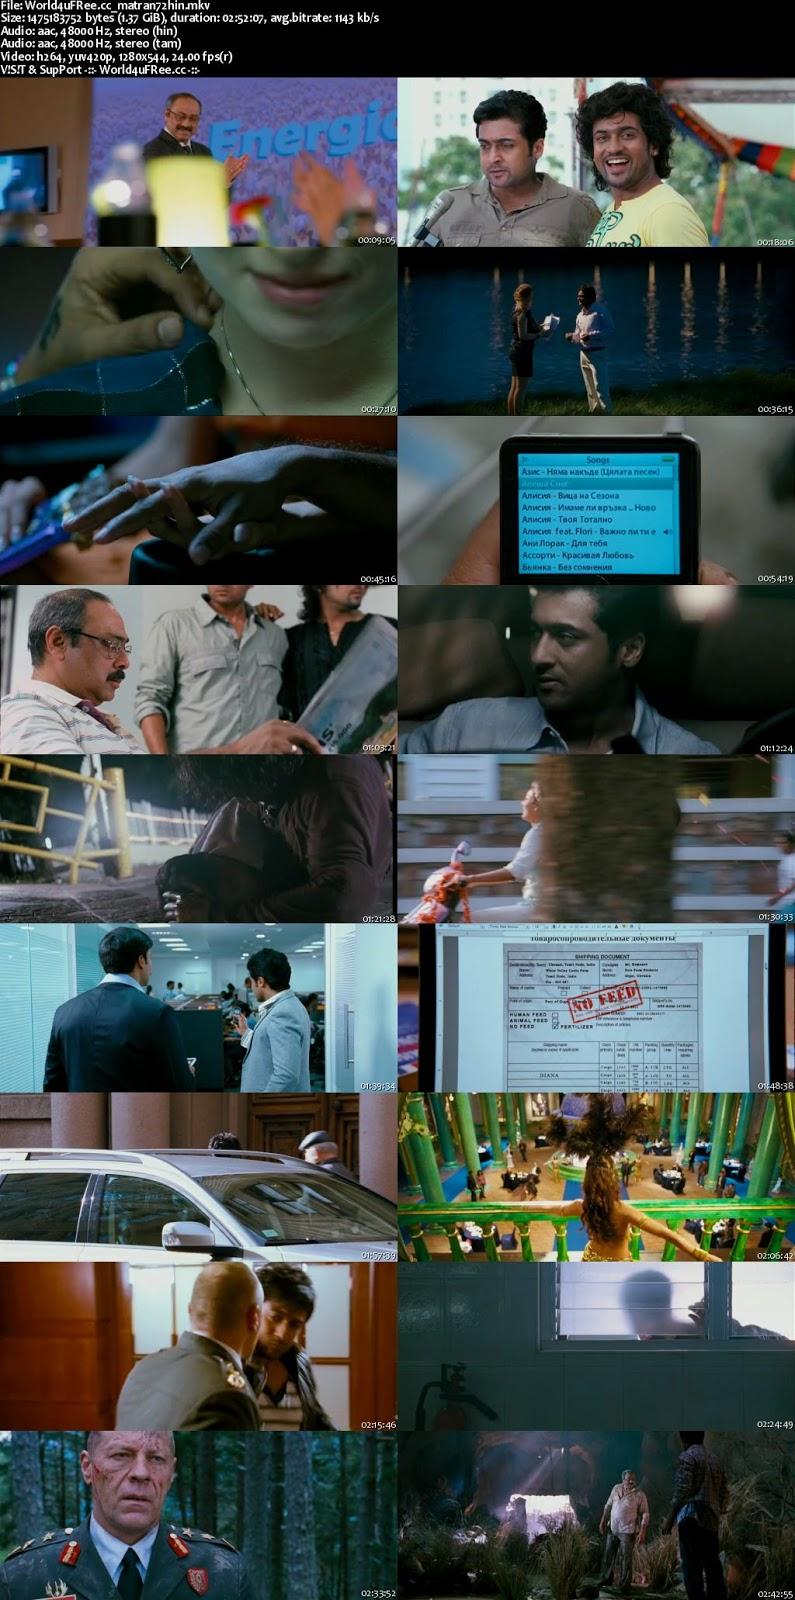 Maattrraan 2012 Dual Audio 720p BRRip 1.3GB hollywood movie Maattrraan hindi dubbed dual audio english hindi languages 720p hdrip brrip free download or watch online at world4ufree.be